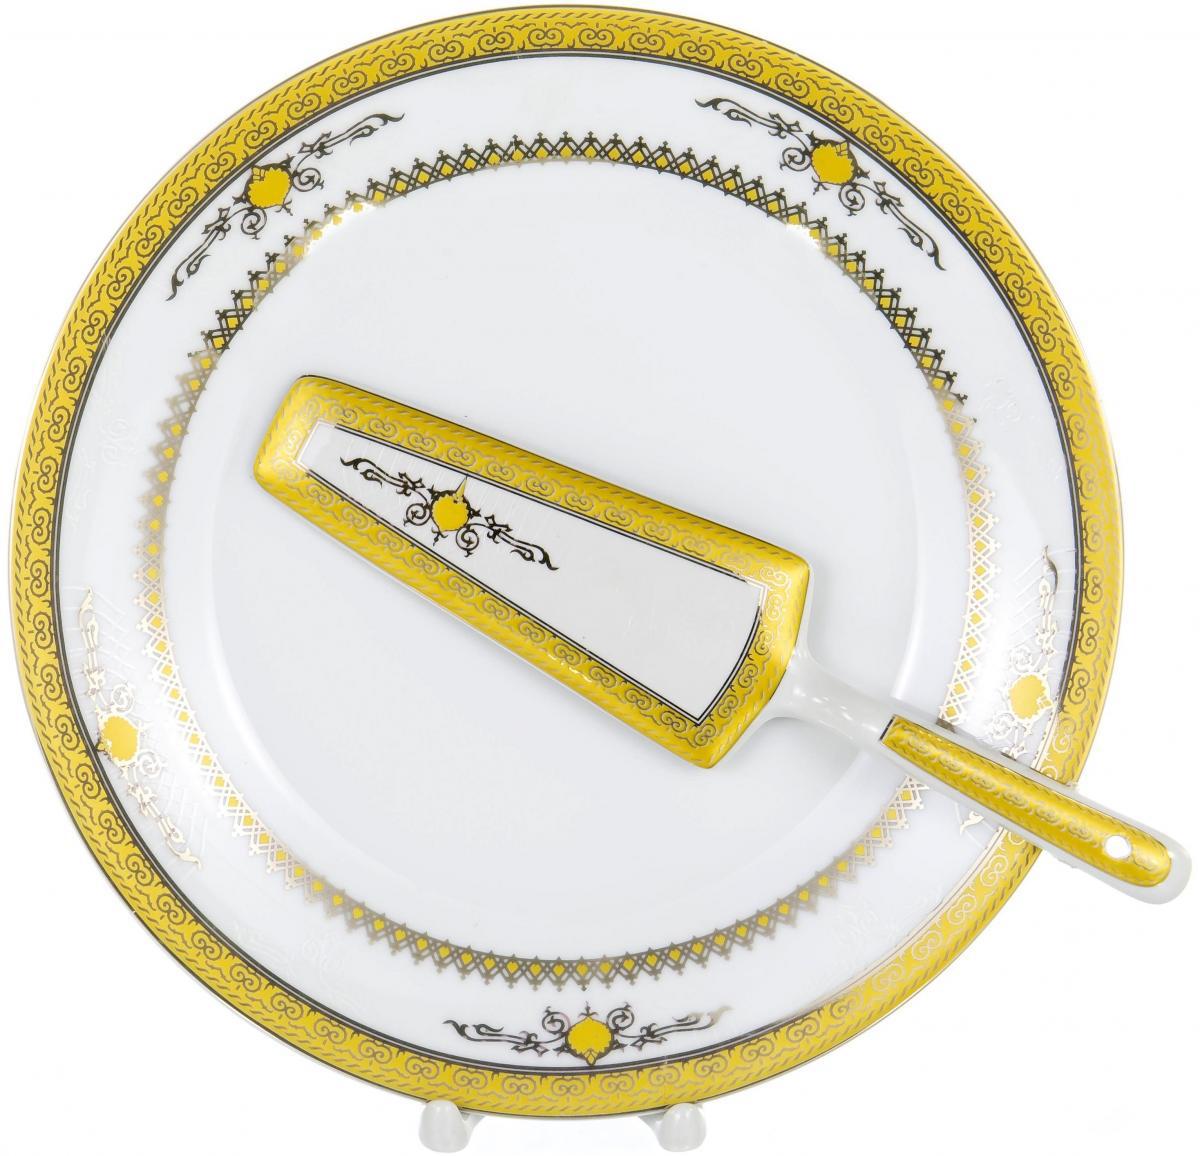 CAKE 2, набор д/торта (2) блюдо 255мм + лопатка, декор - золото-серебро, подарочная упаковка